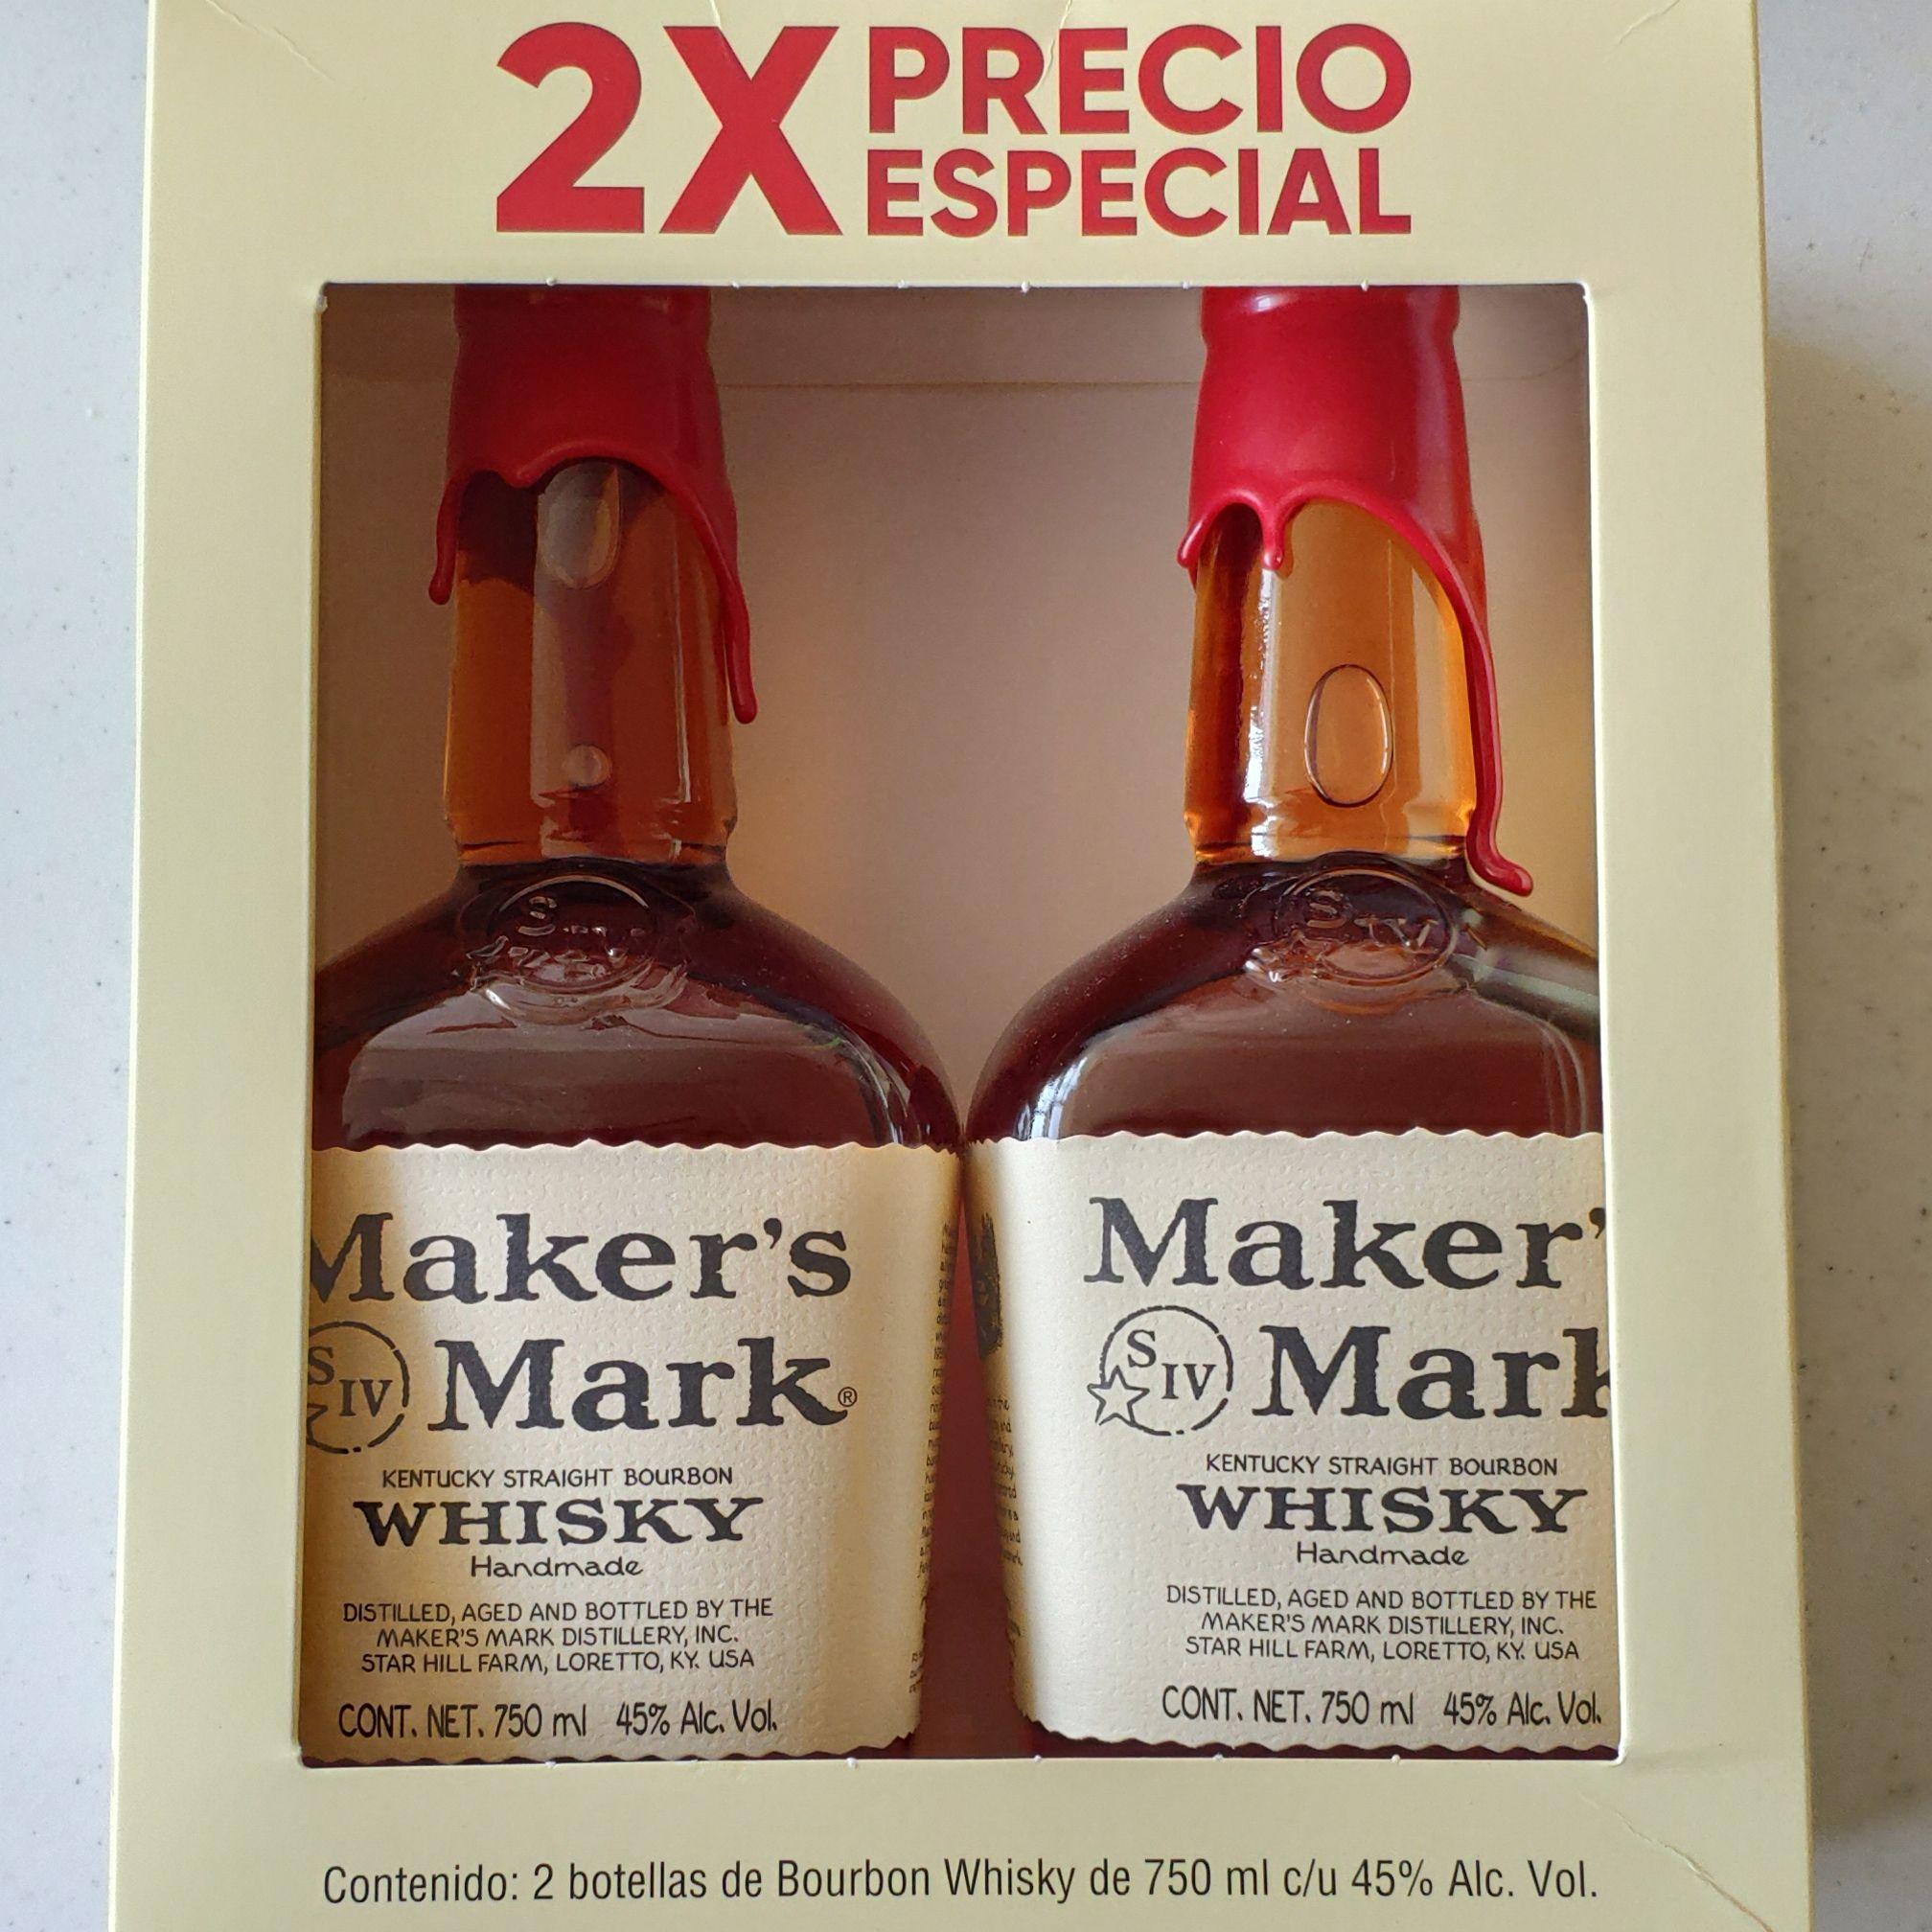 Walmart: Maker's Mark Whisky 2X precio especial